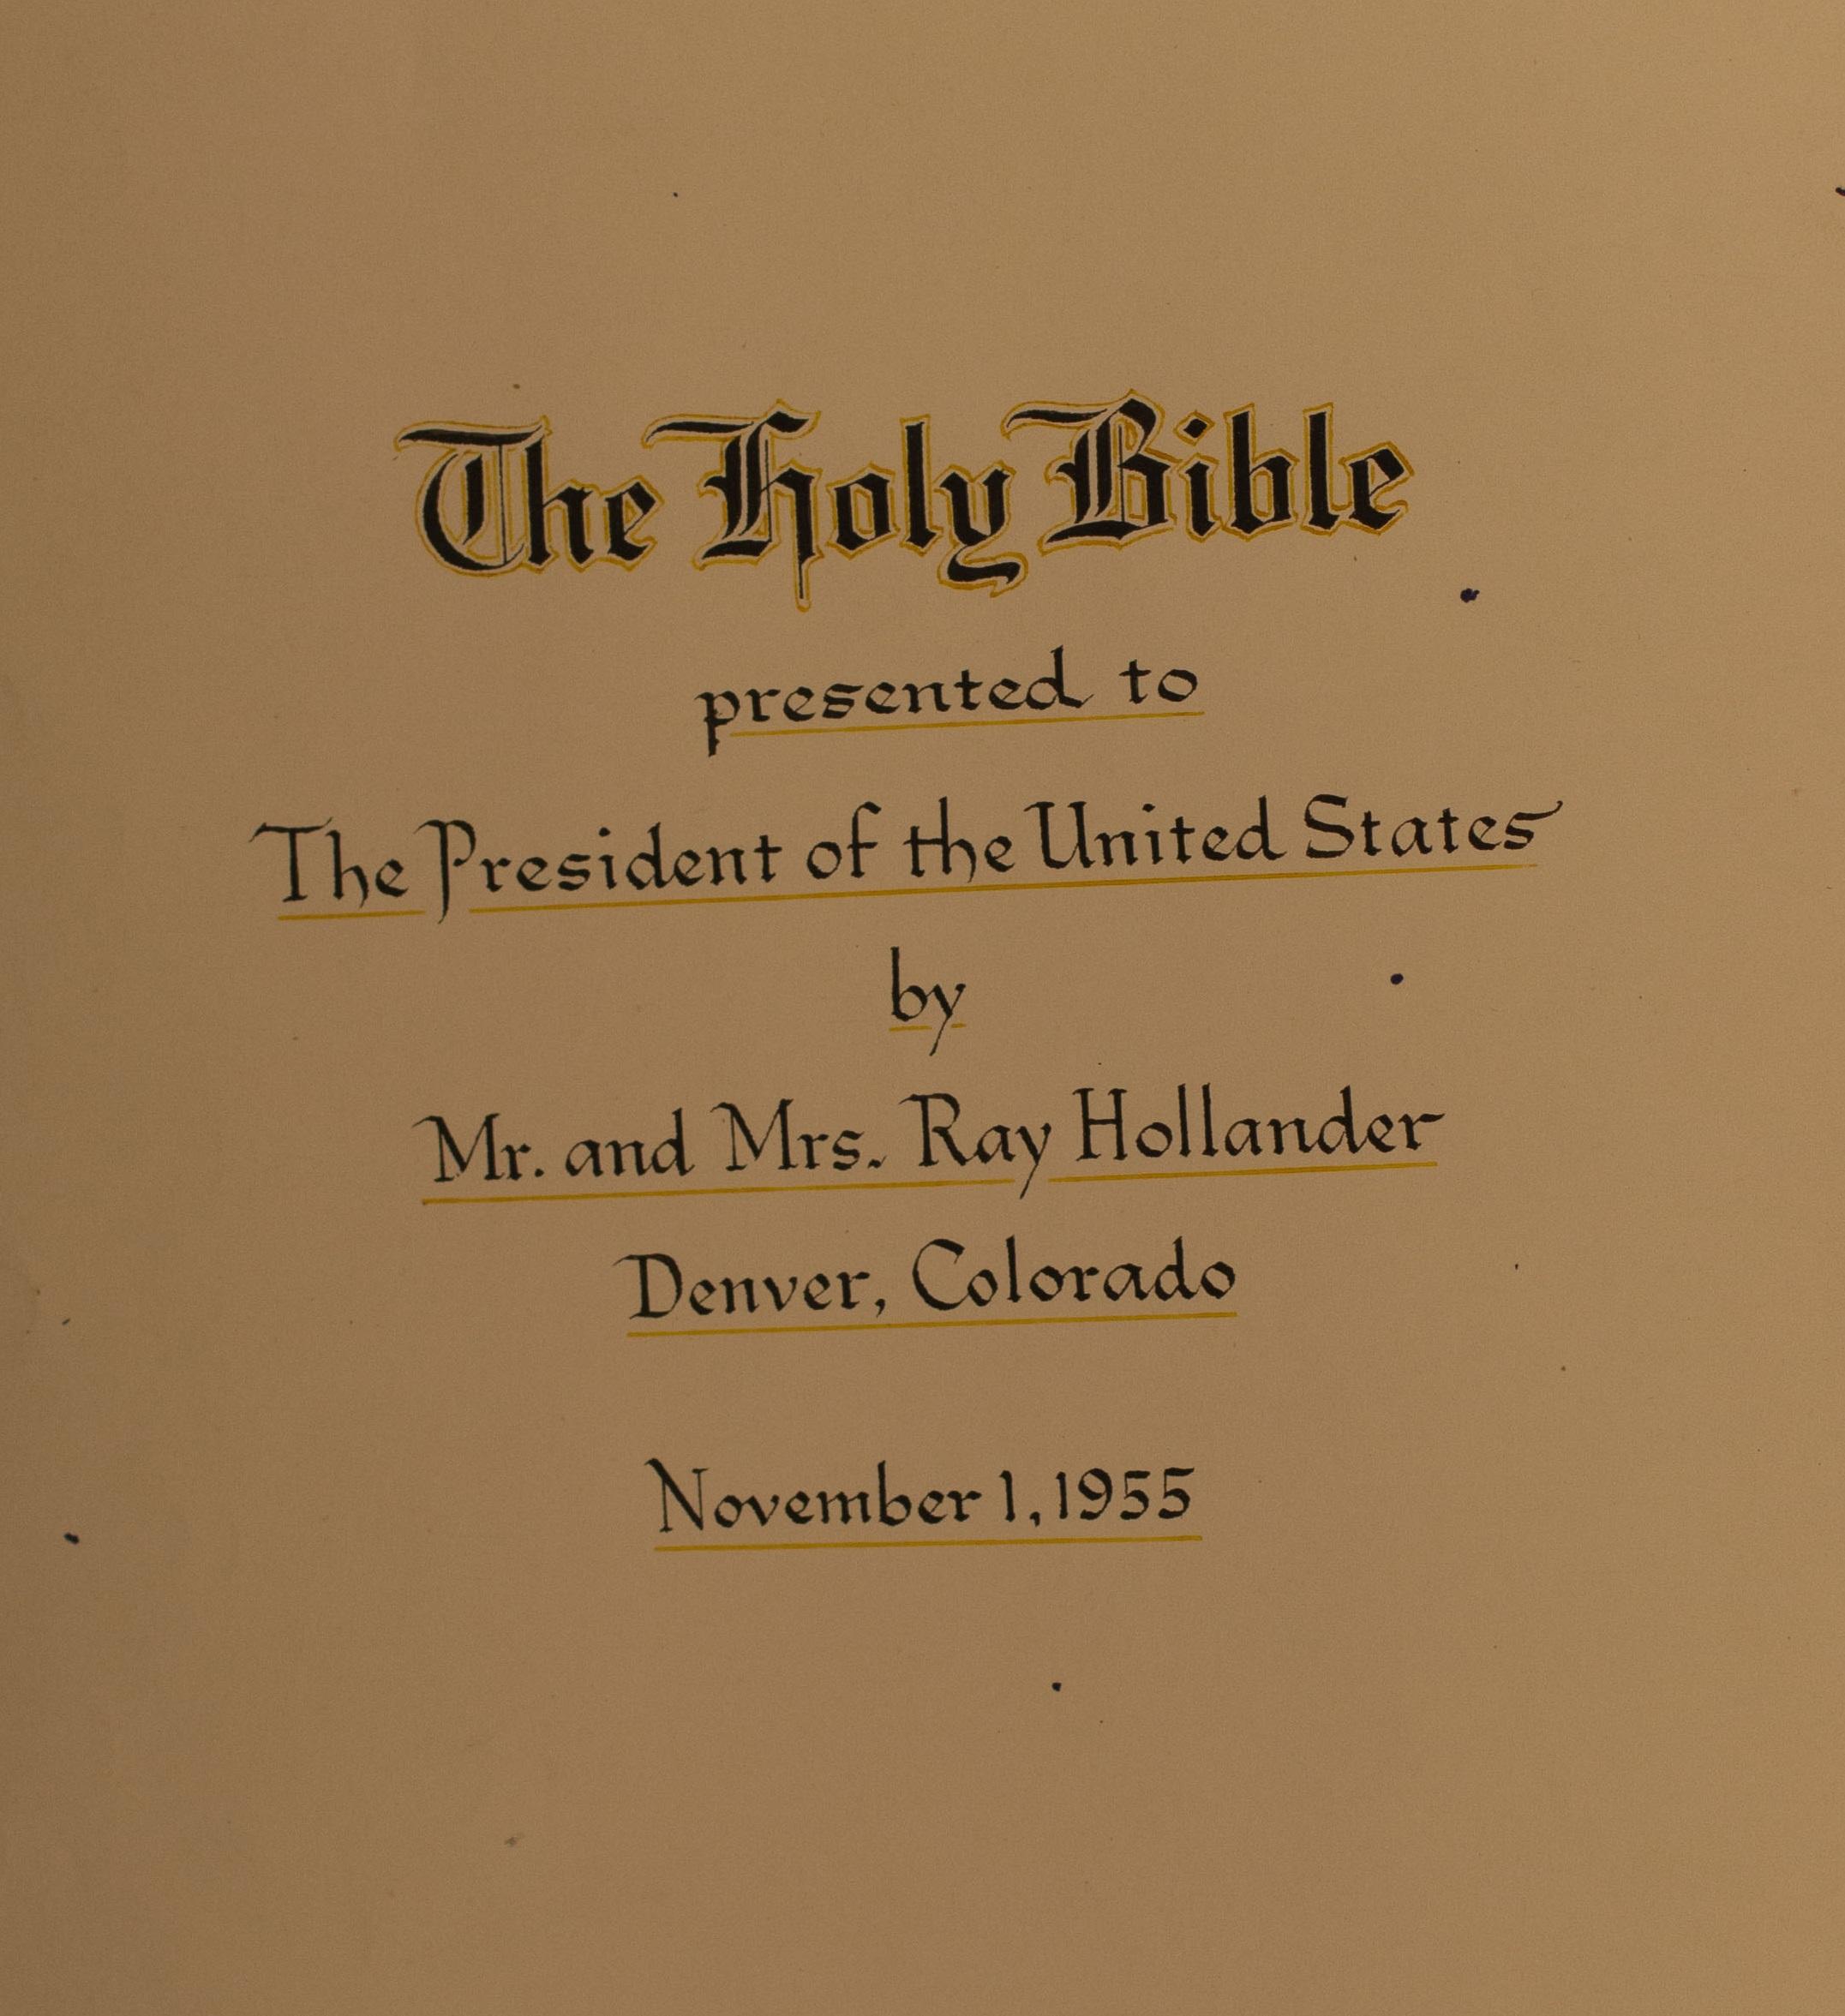 The Blue Ribbon Bible